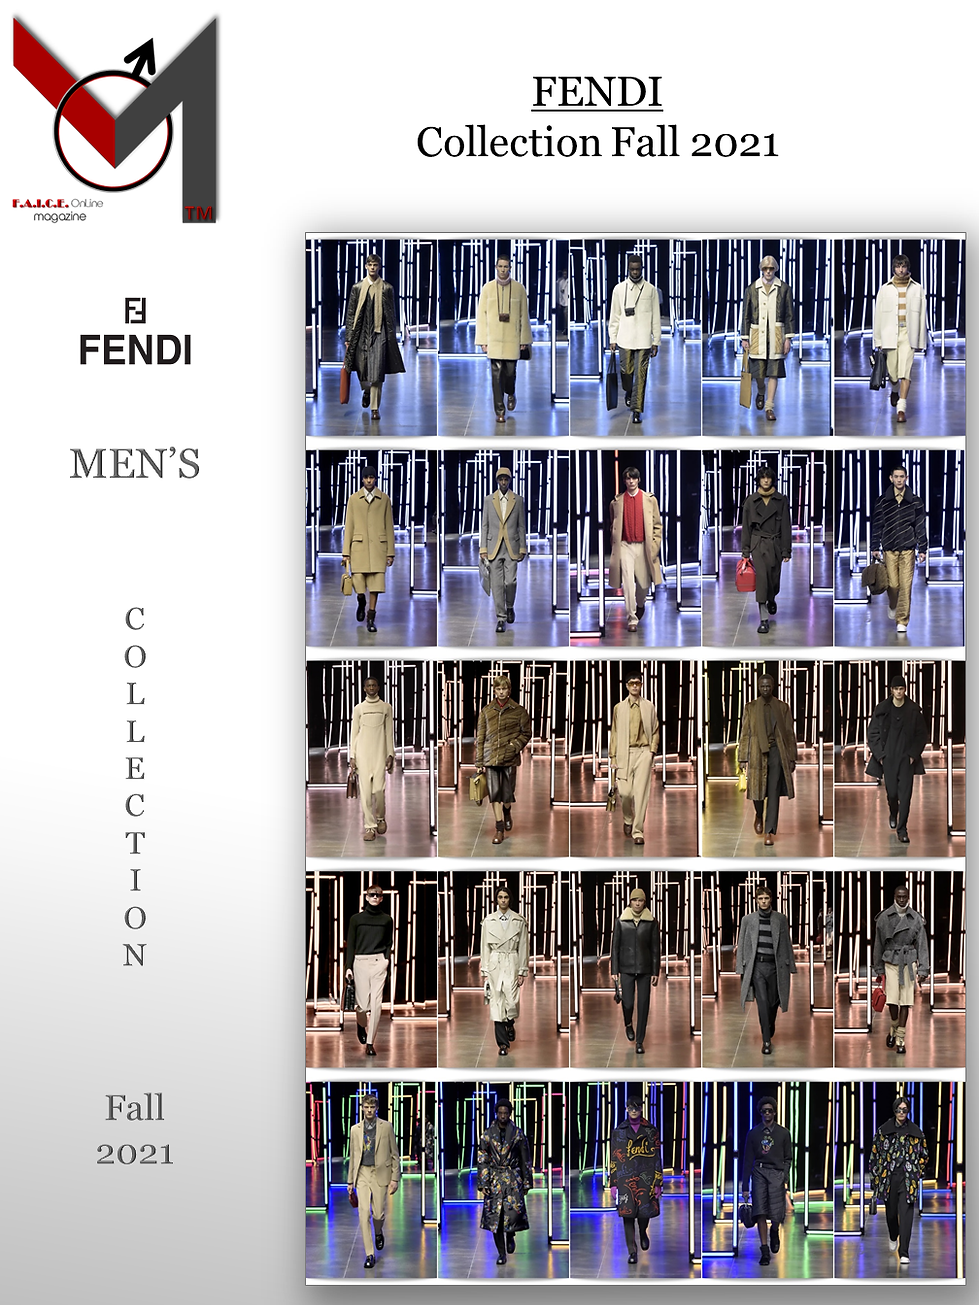 FENDI-Collection 2021